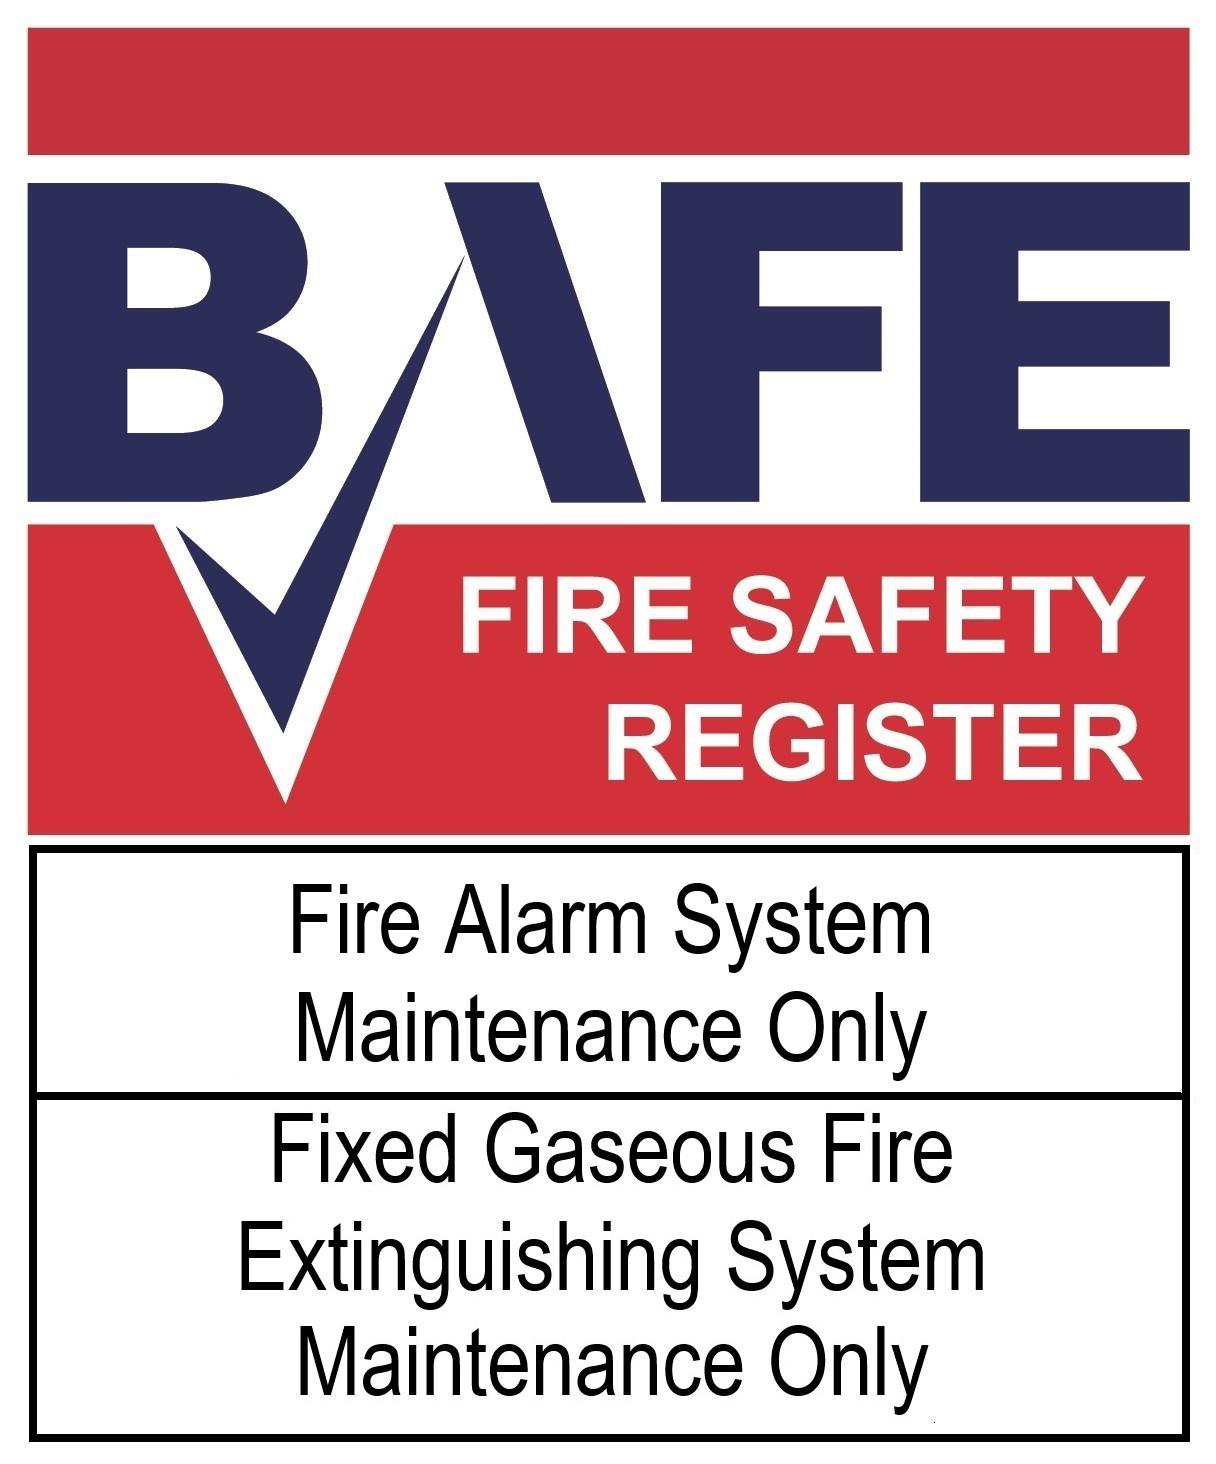 B.A.F.E. Registered